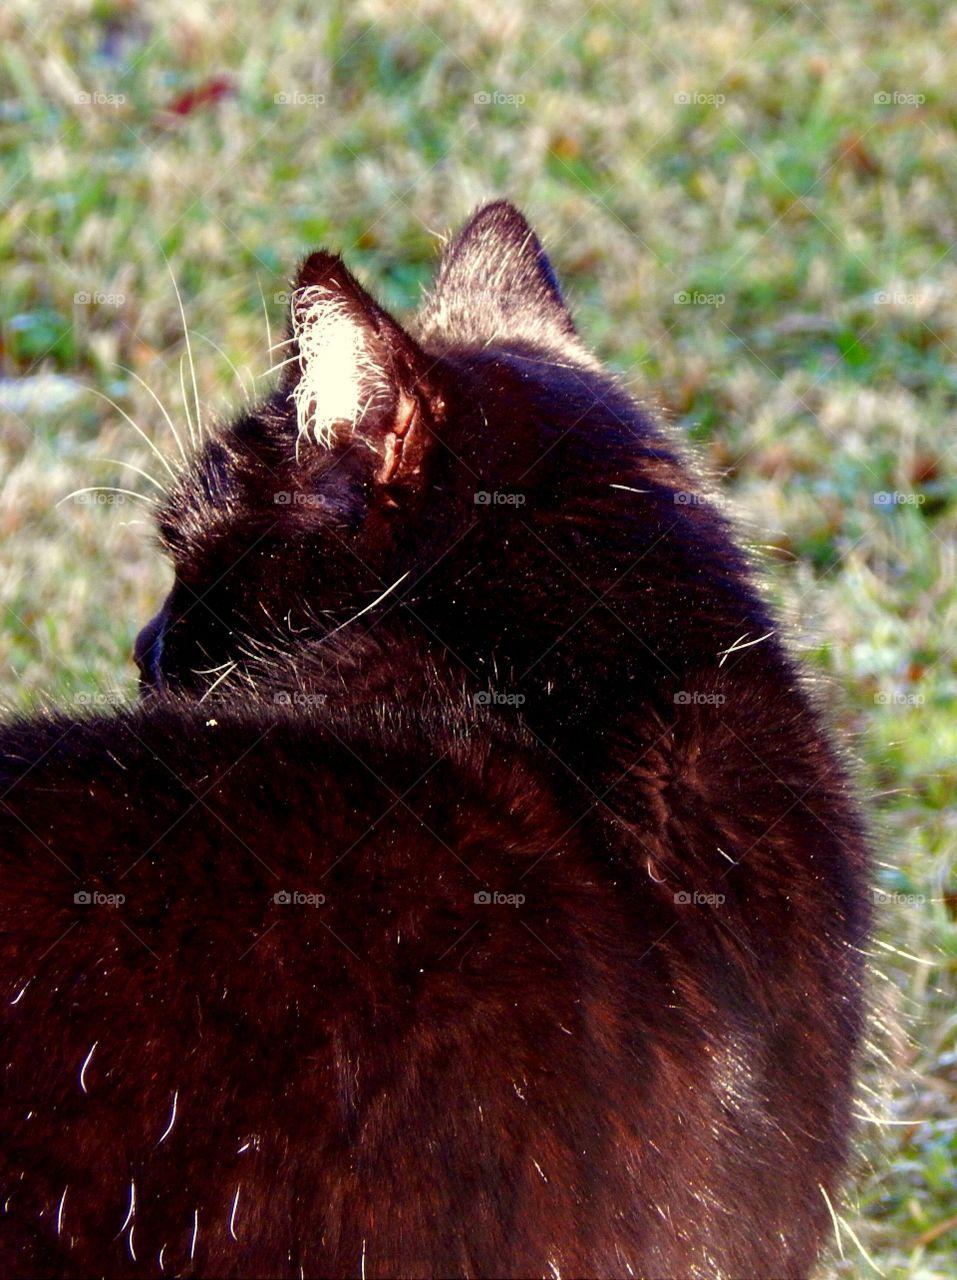 Fur of my black cat at sun